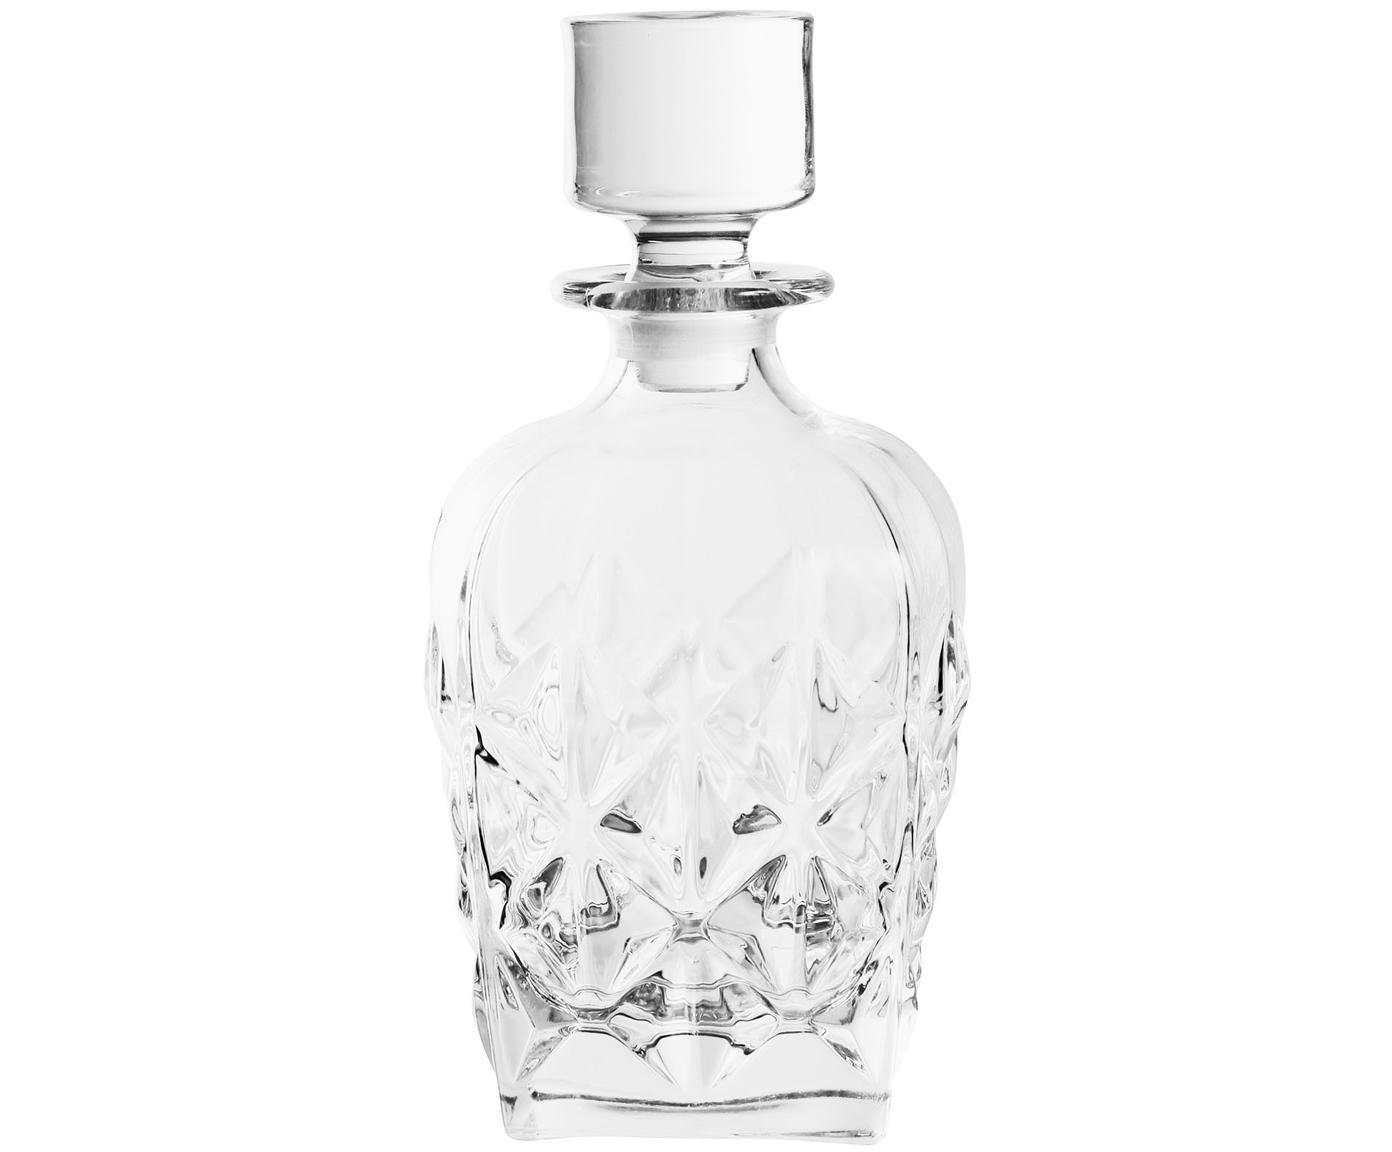 Kristall-Dekanter Fine, Kristallglas, Transparent, H 17 cm